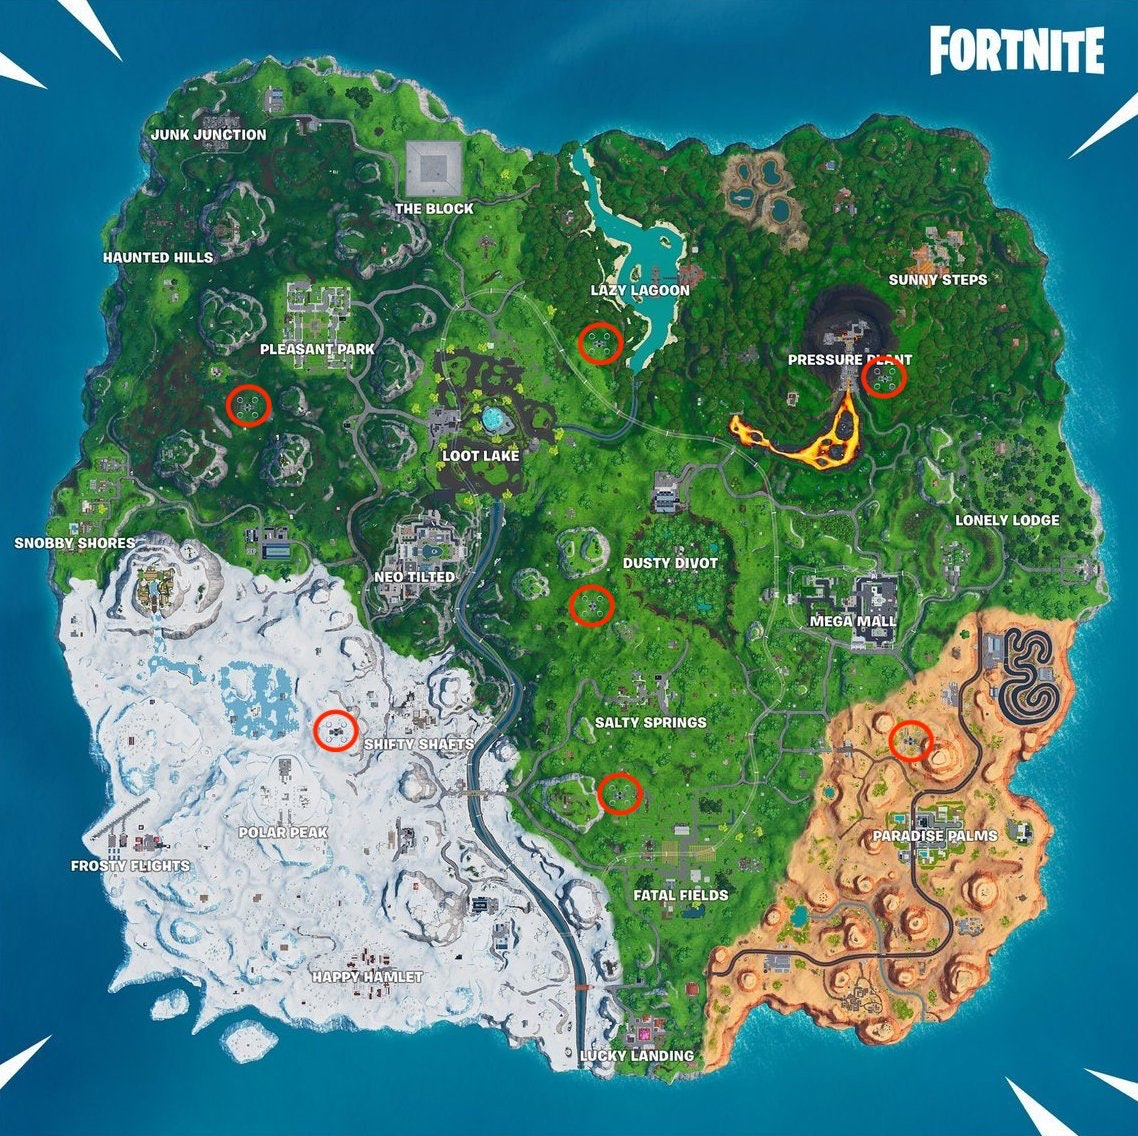 Fortnite Sky platform map